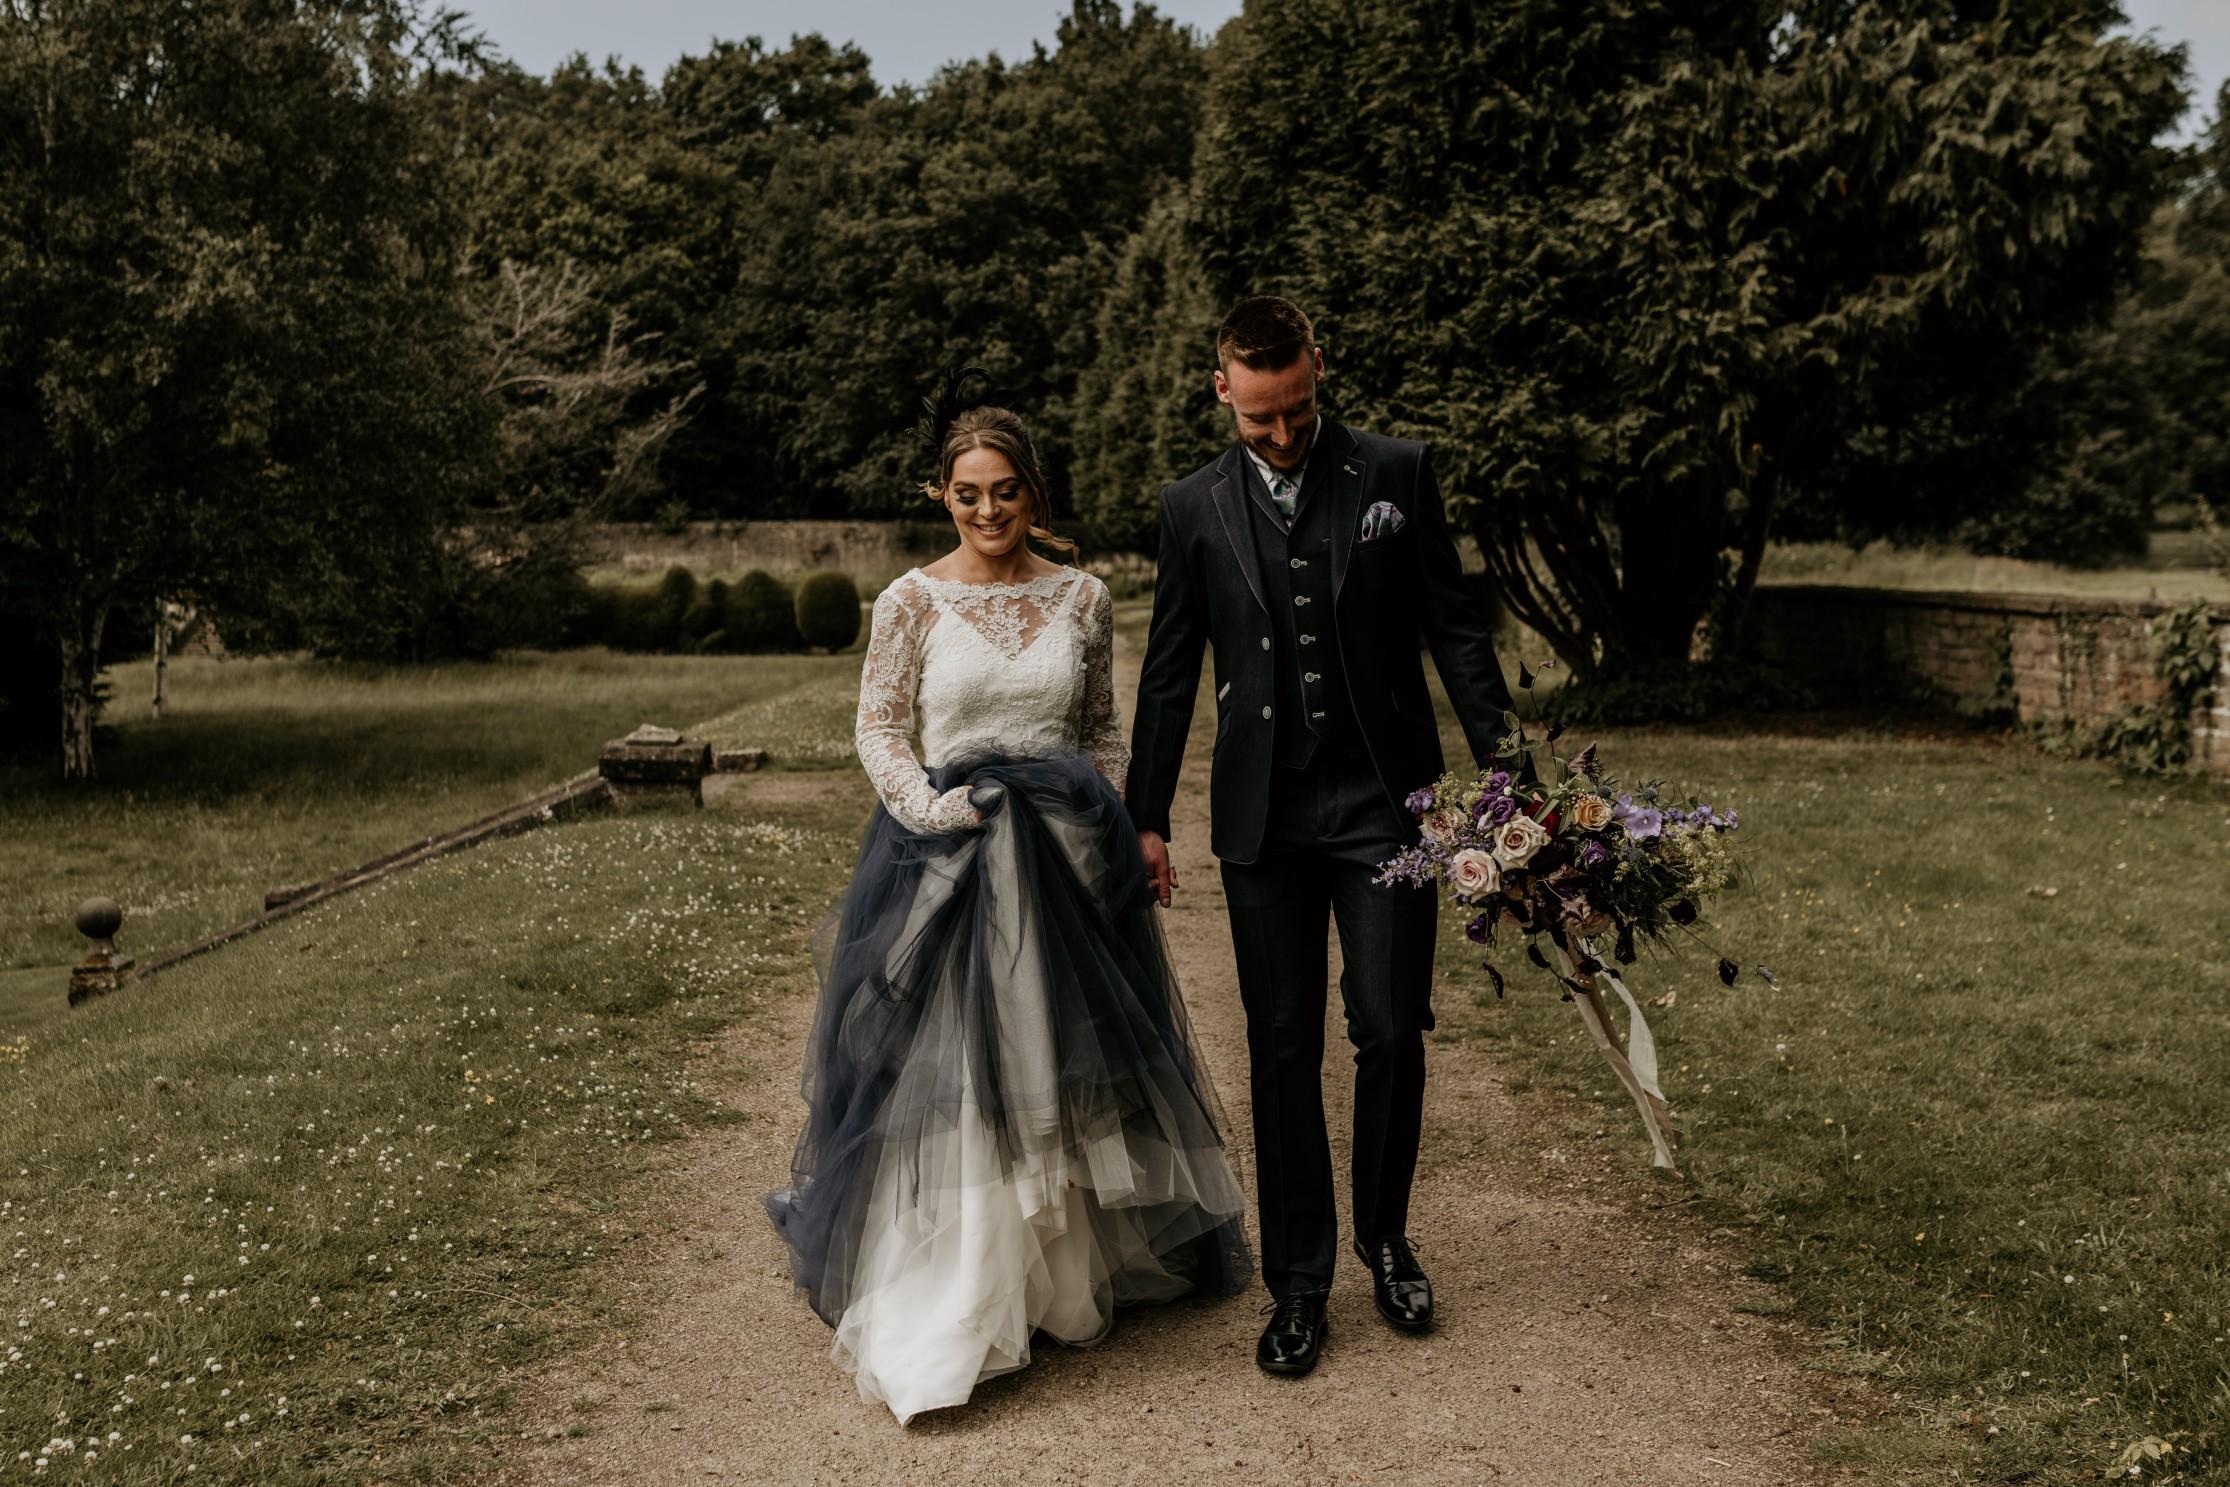 country garden wedding - alternative wedding dress - coloured wedding dress - peacock inspired wedding